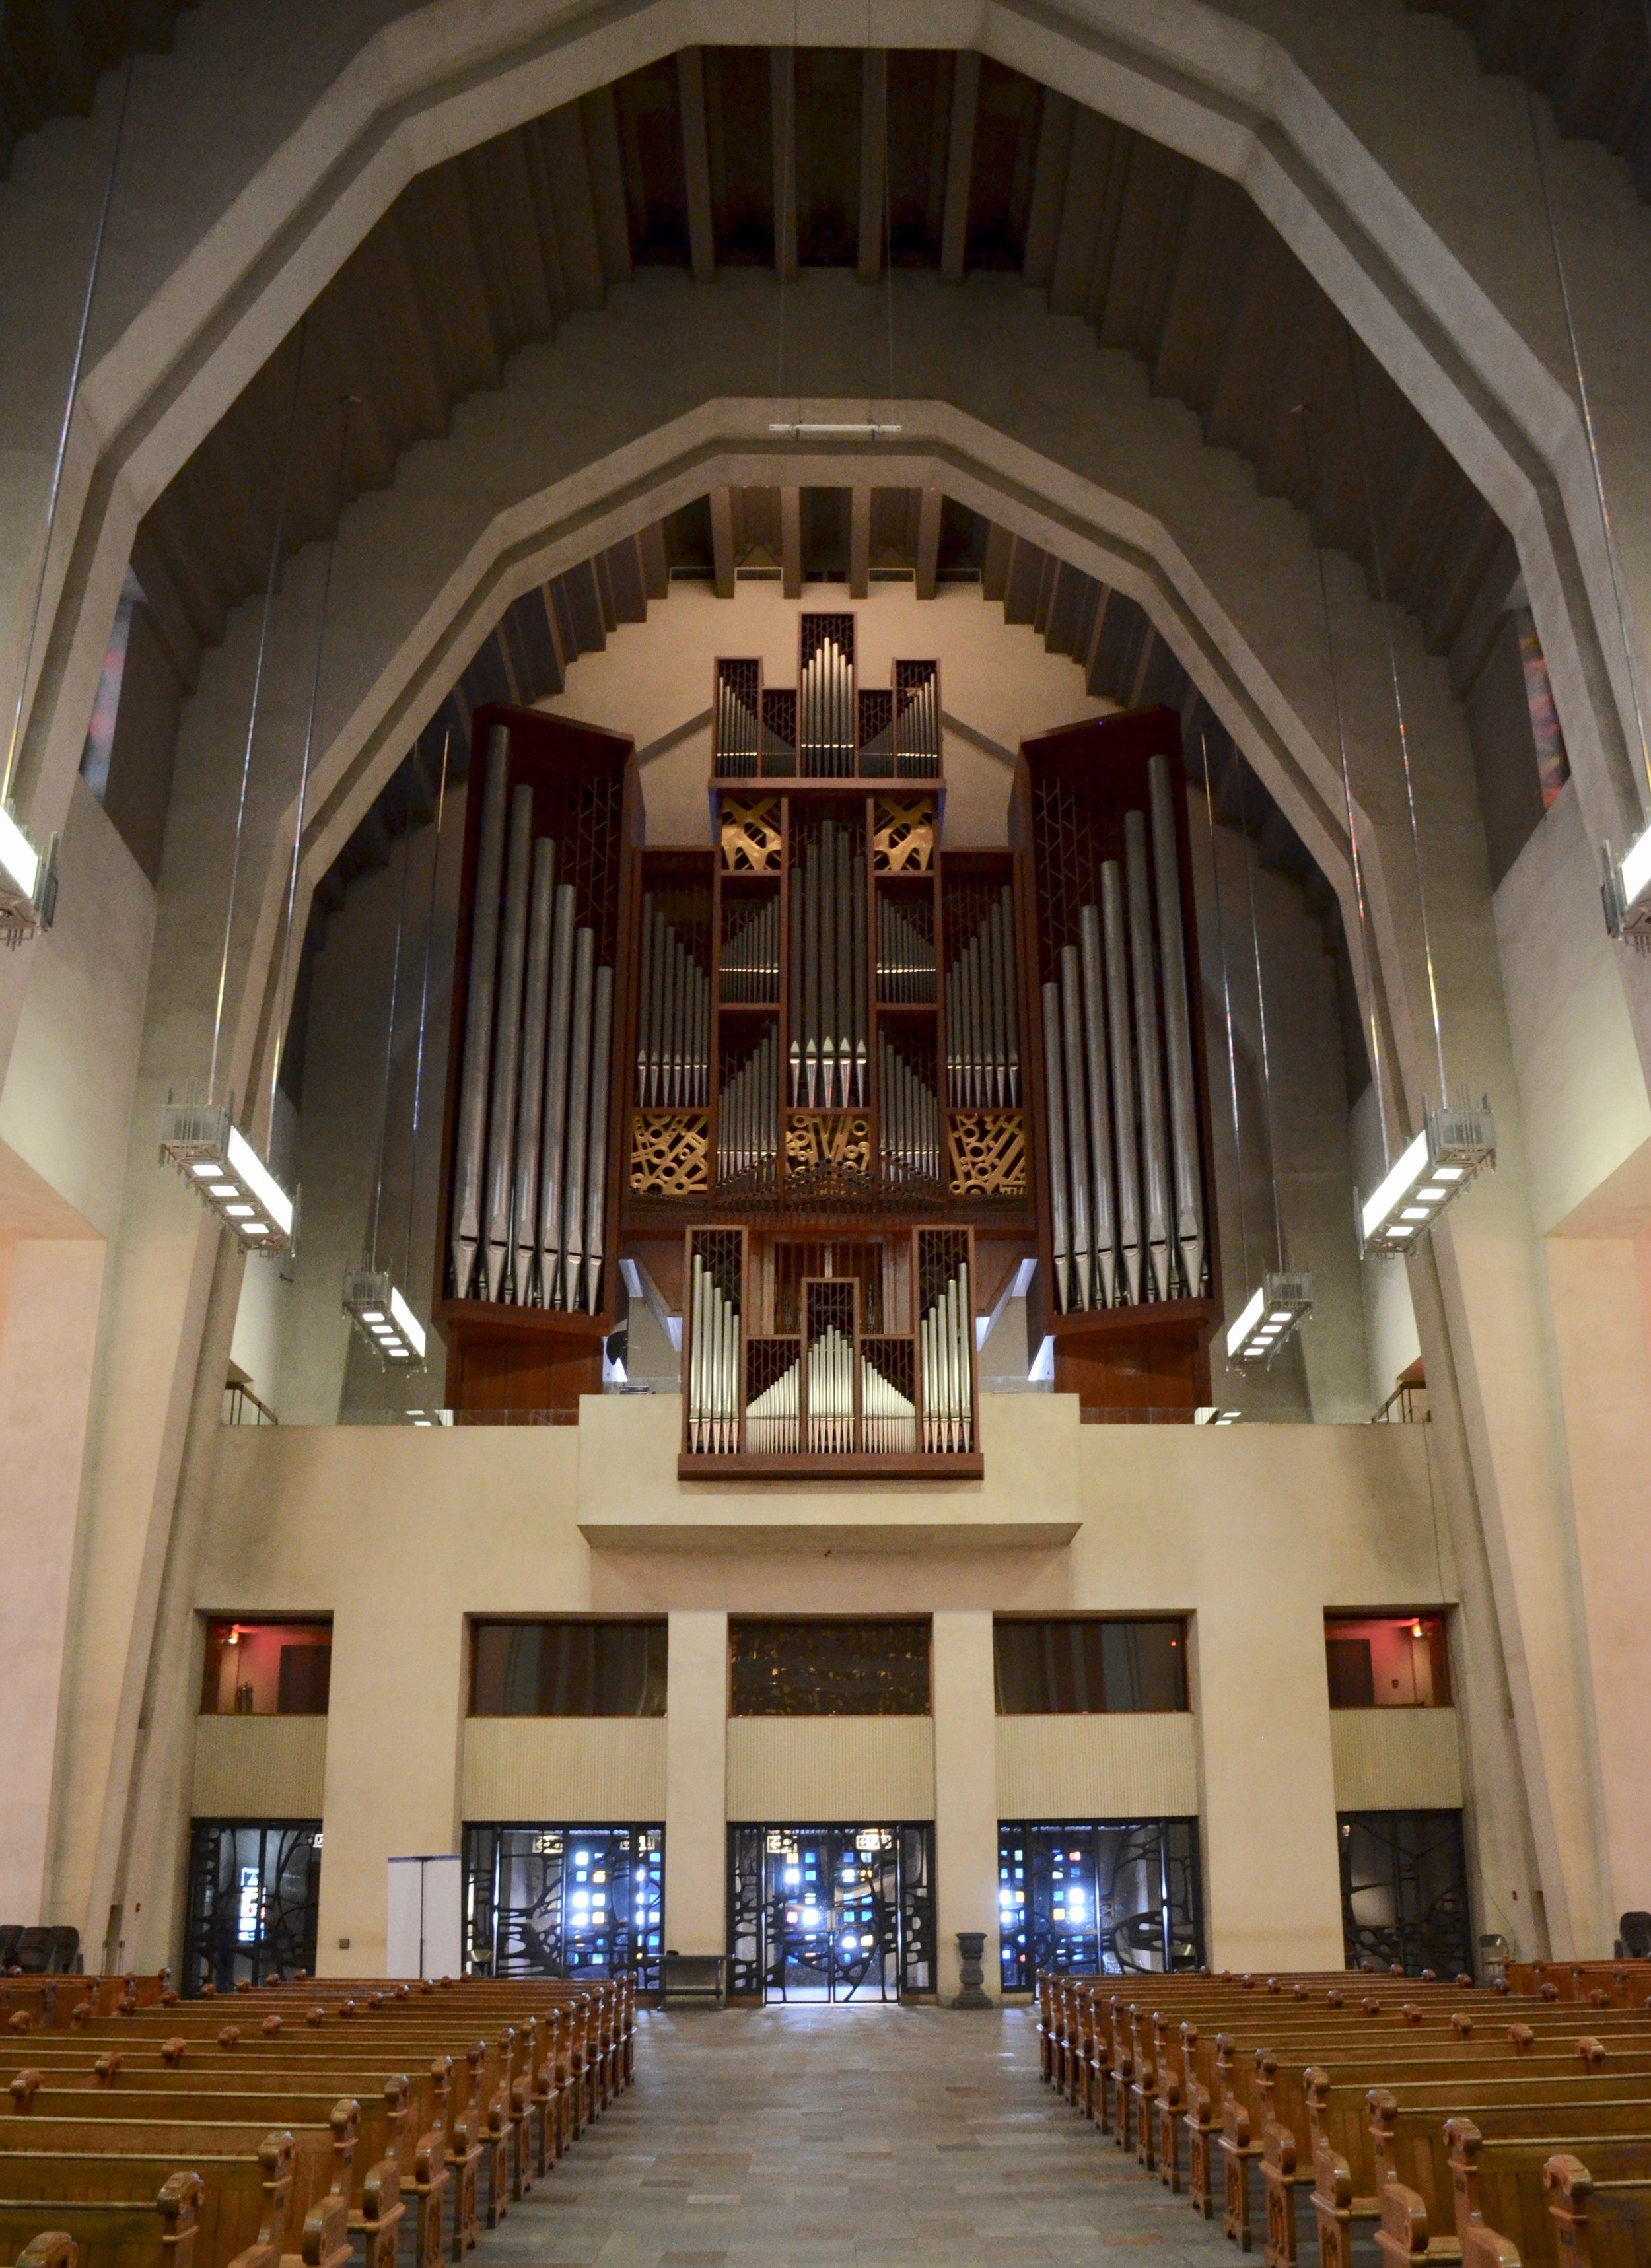 The Beckerath organ, St. Joseph Oratory, Montreal